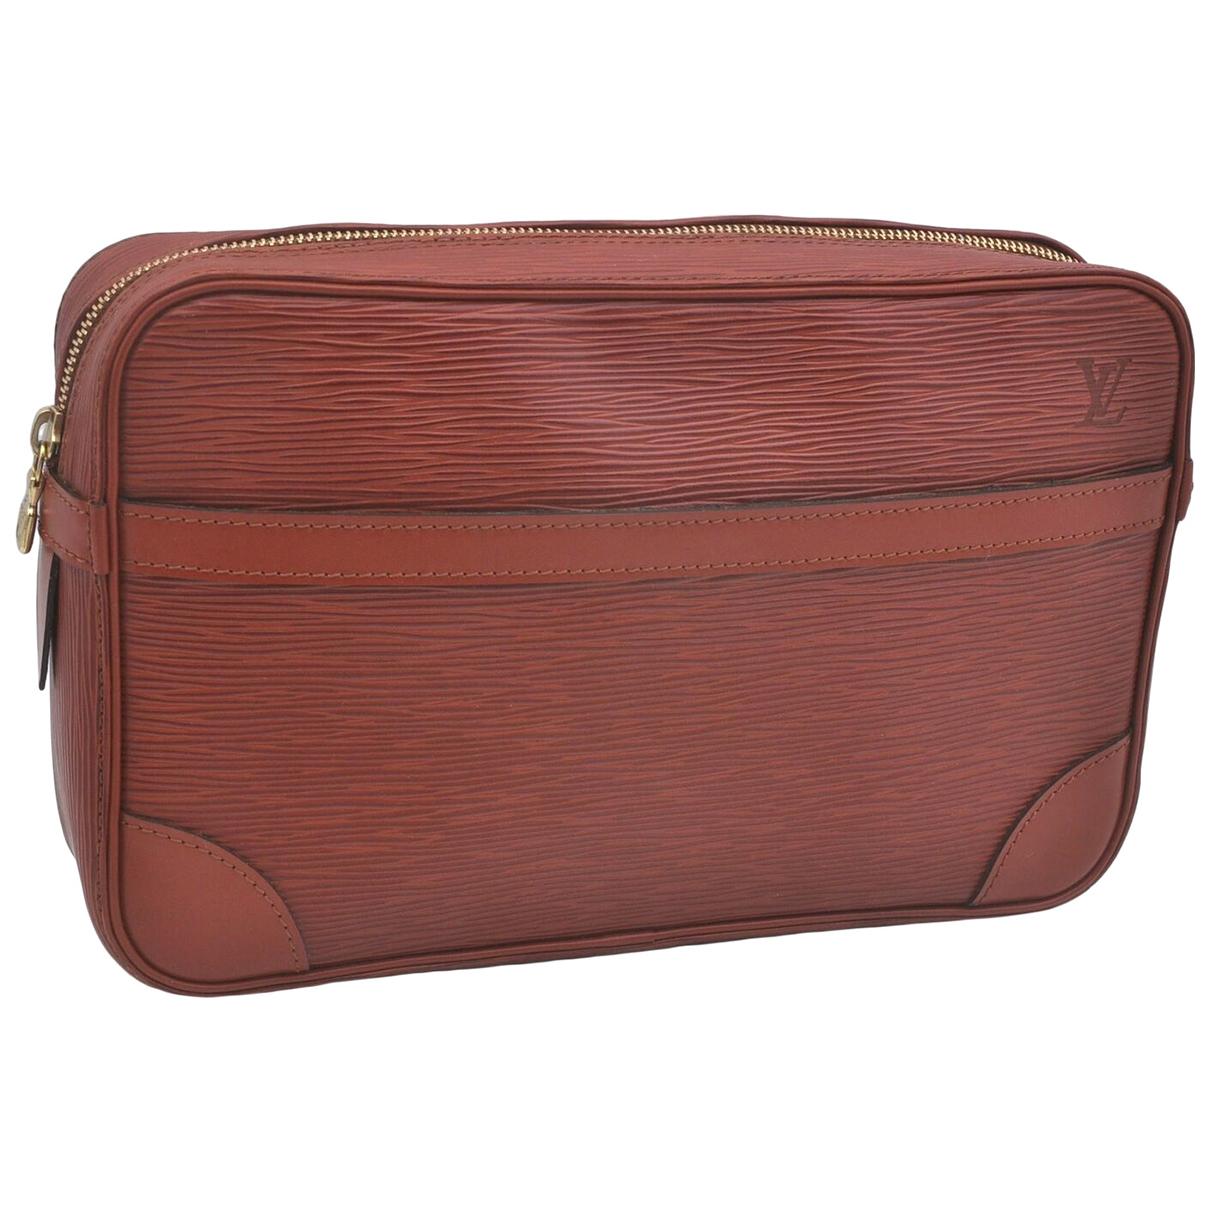 Louis Vuitton \N Brown Leather Clutch bag for Women \N